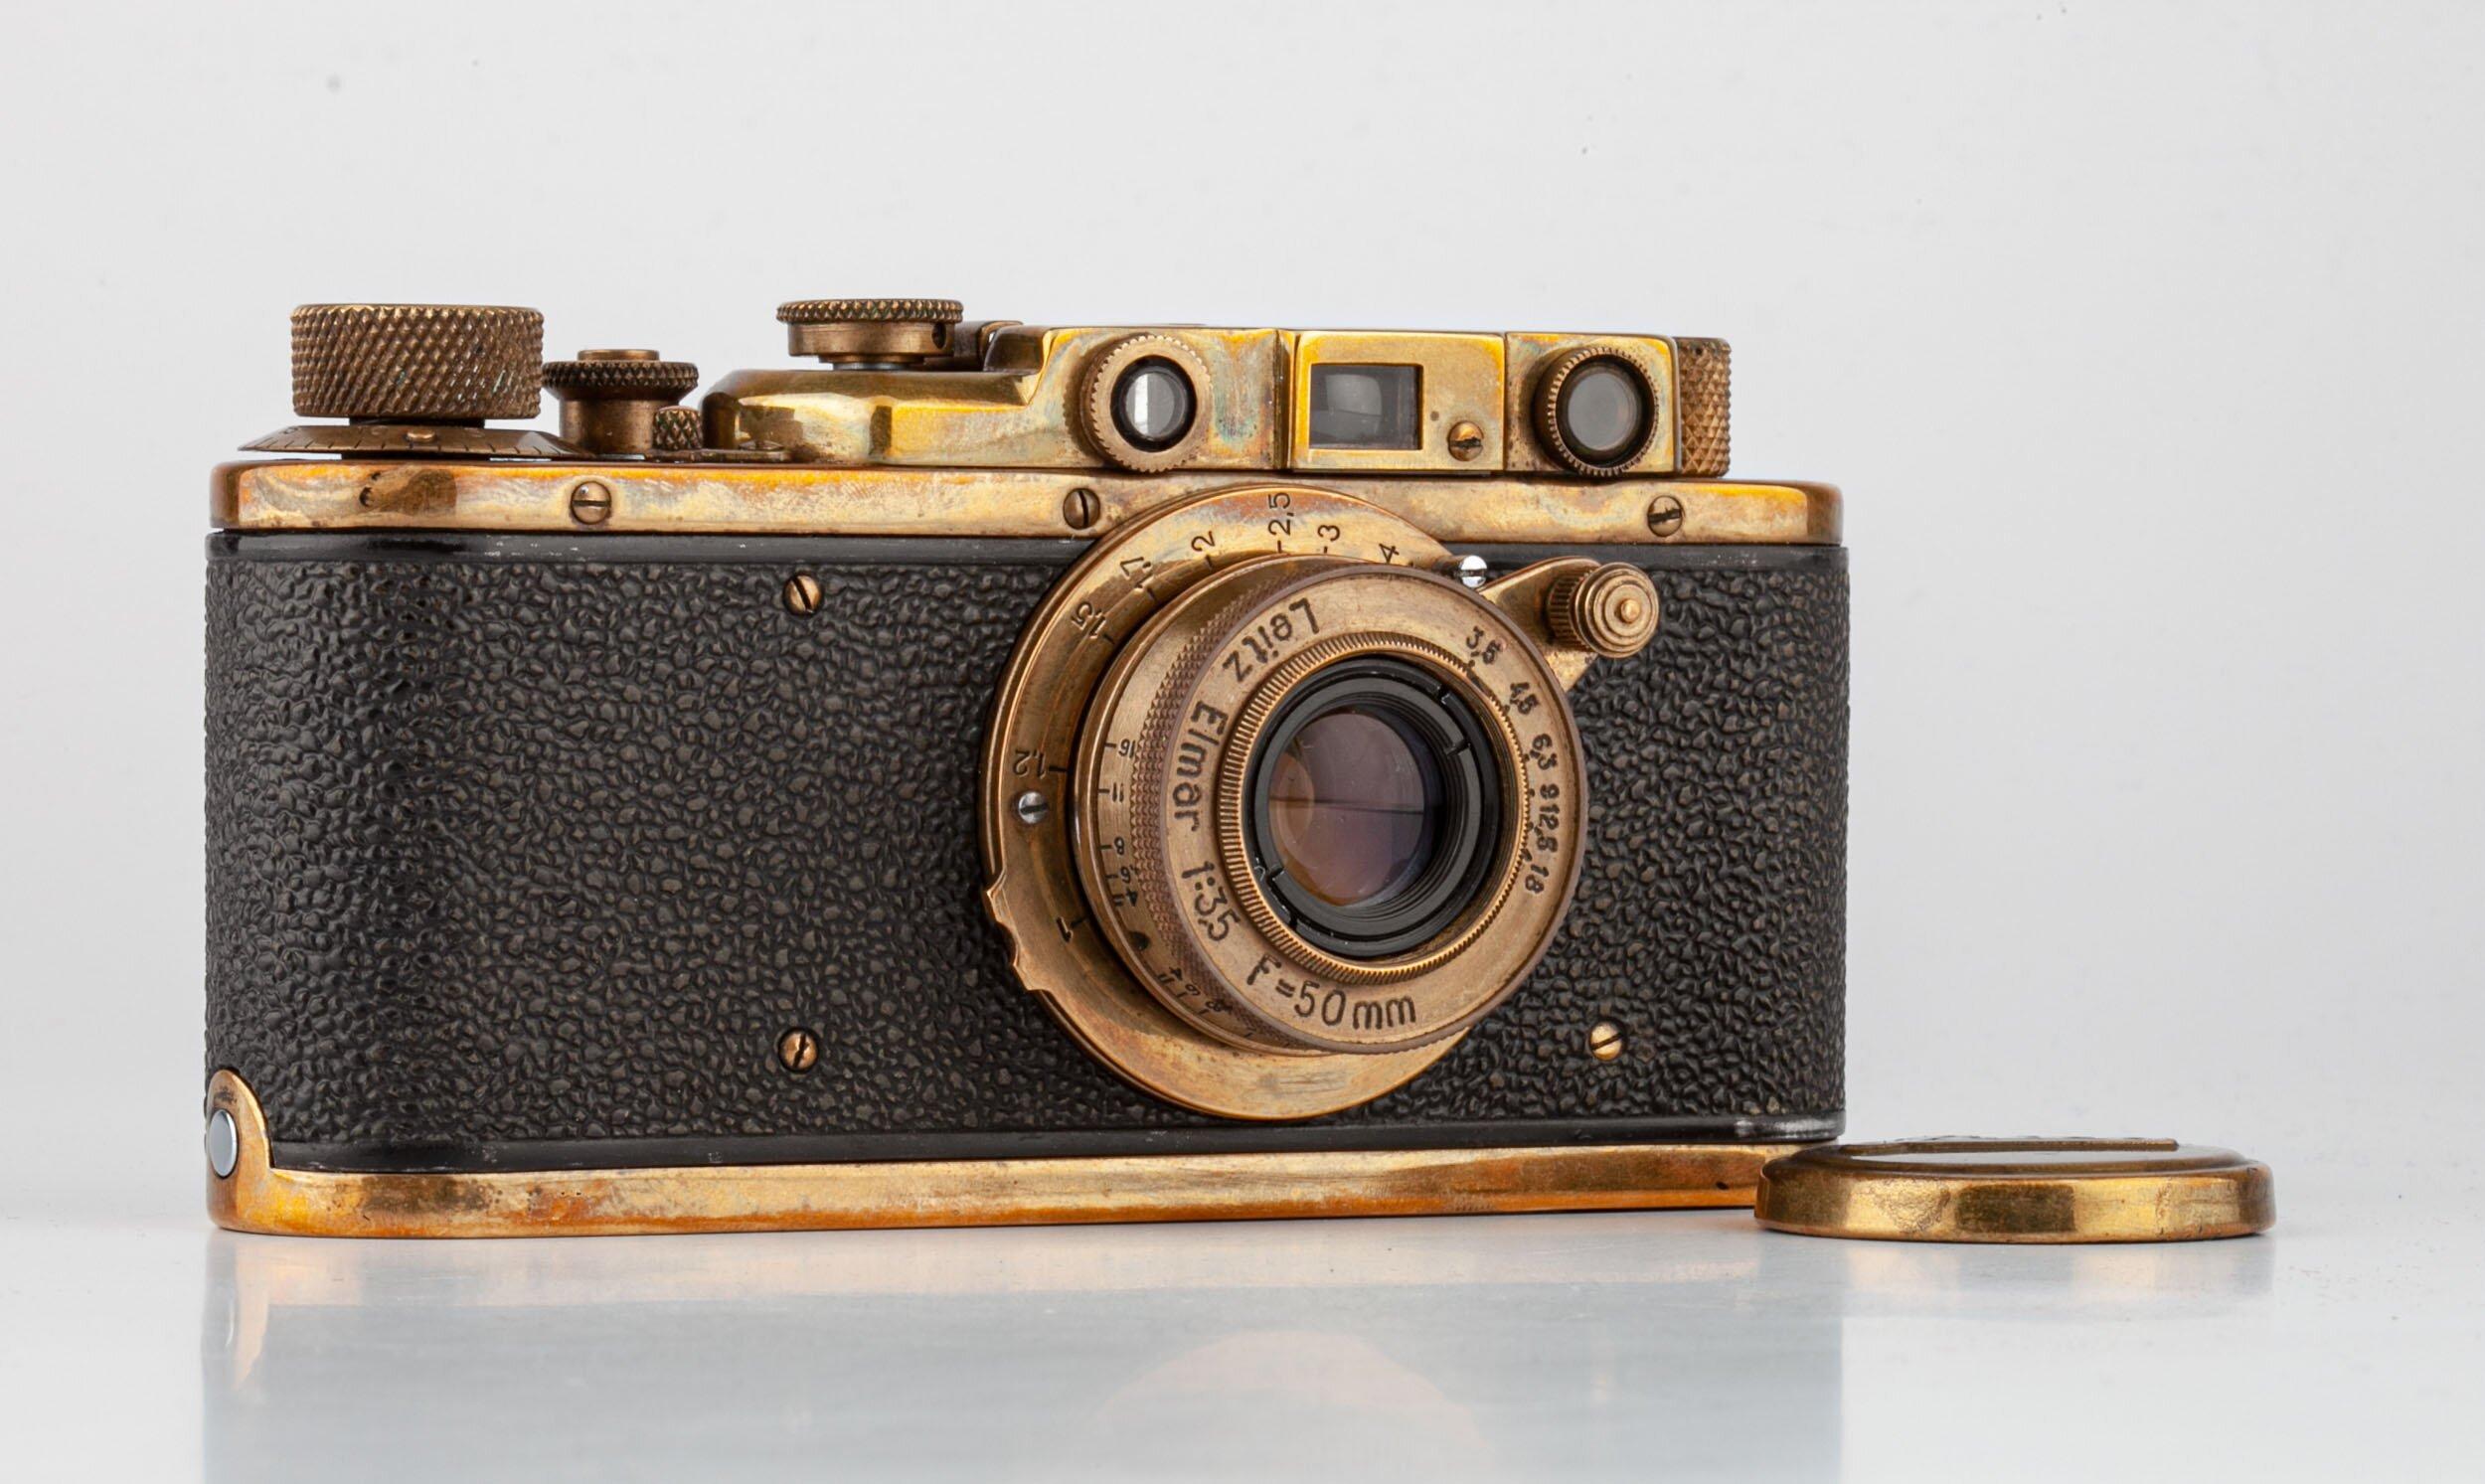 Leitz Leica Fed Zorkie with Leitz Elmar 50mm F3.5